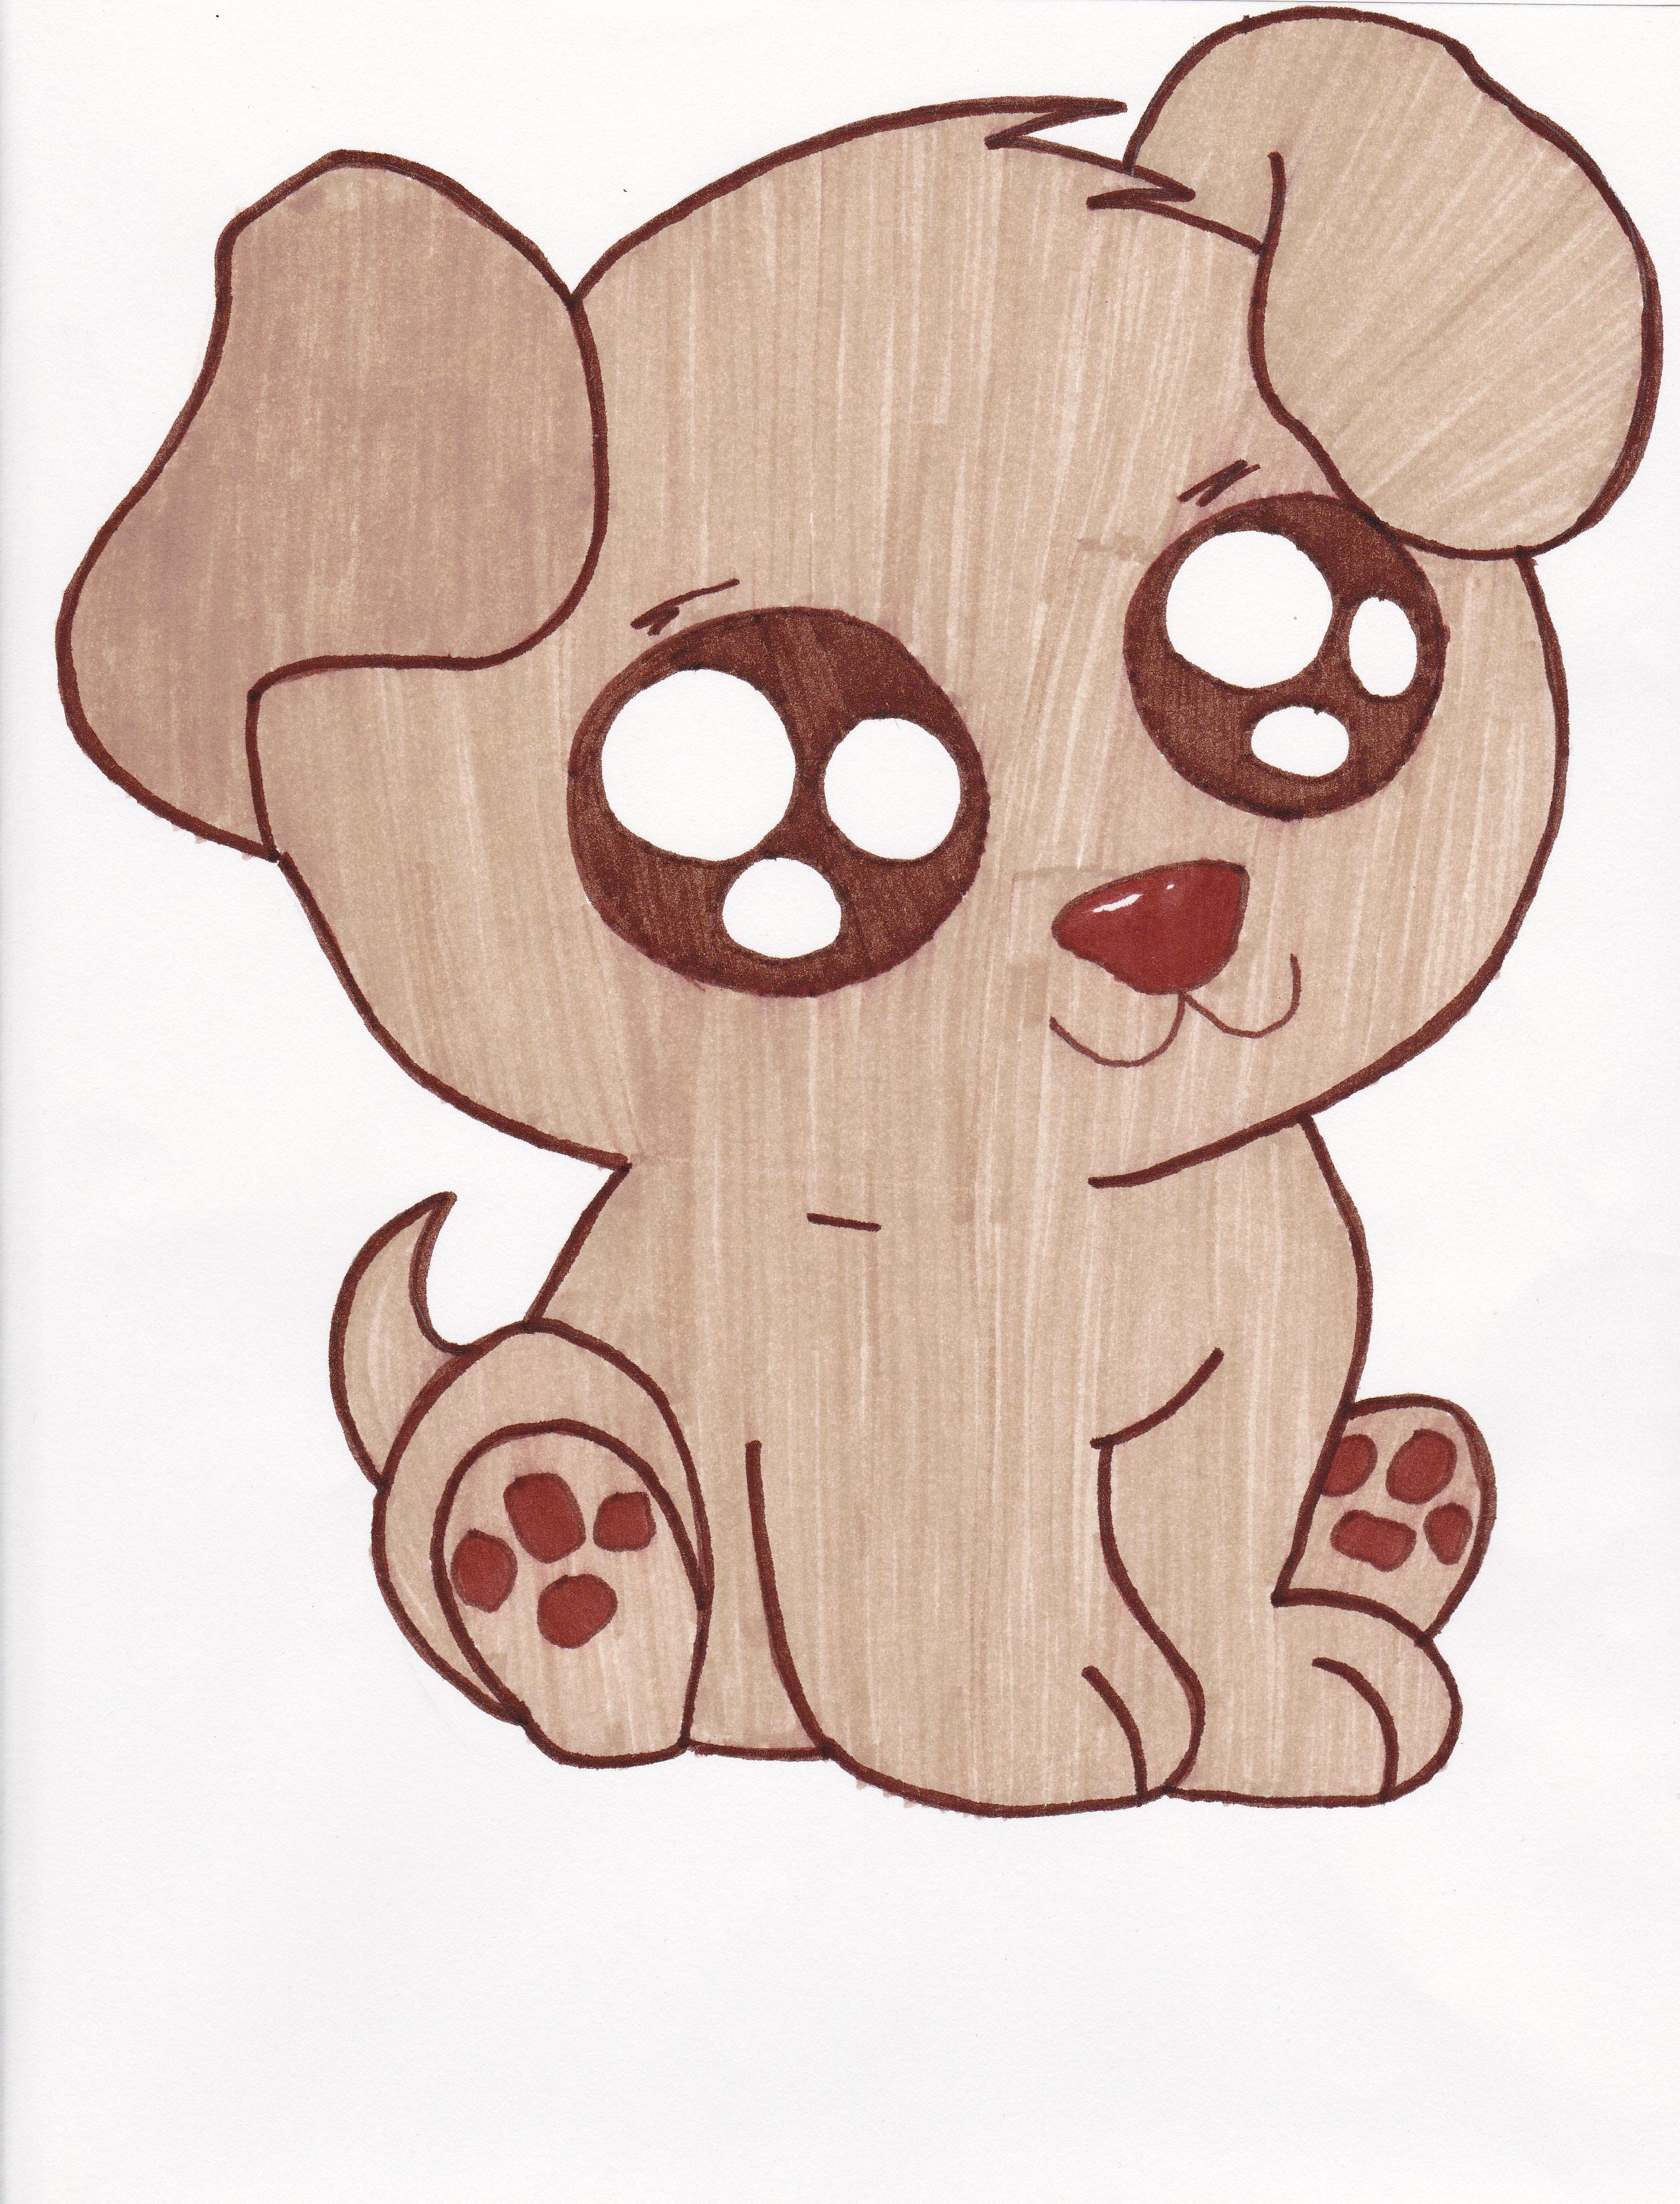 2512x3296 Cute Drawing Of A Puppy Cute drawings Cute Puppies Drawings